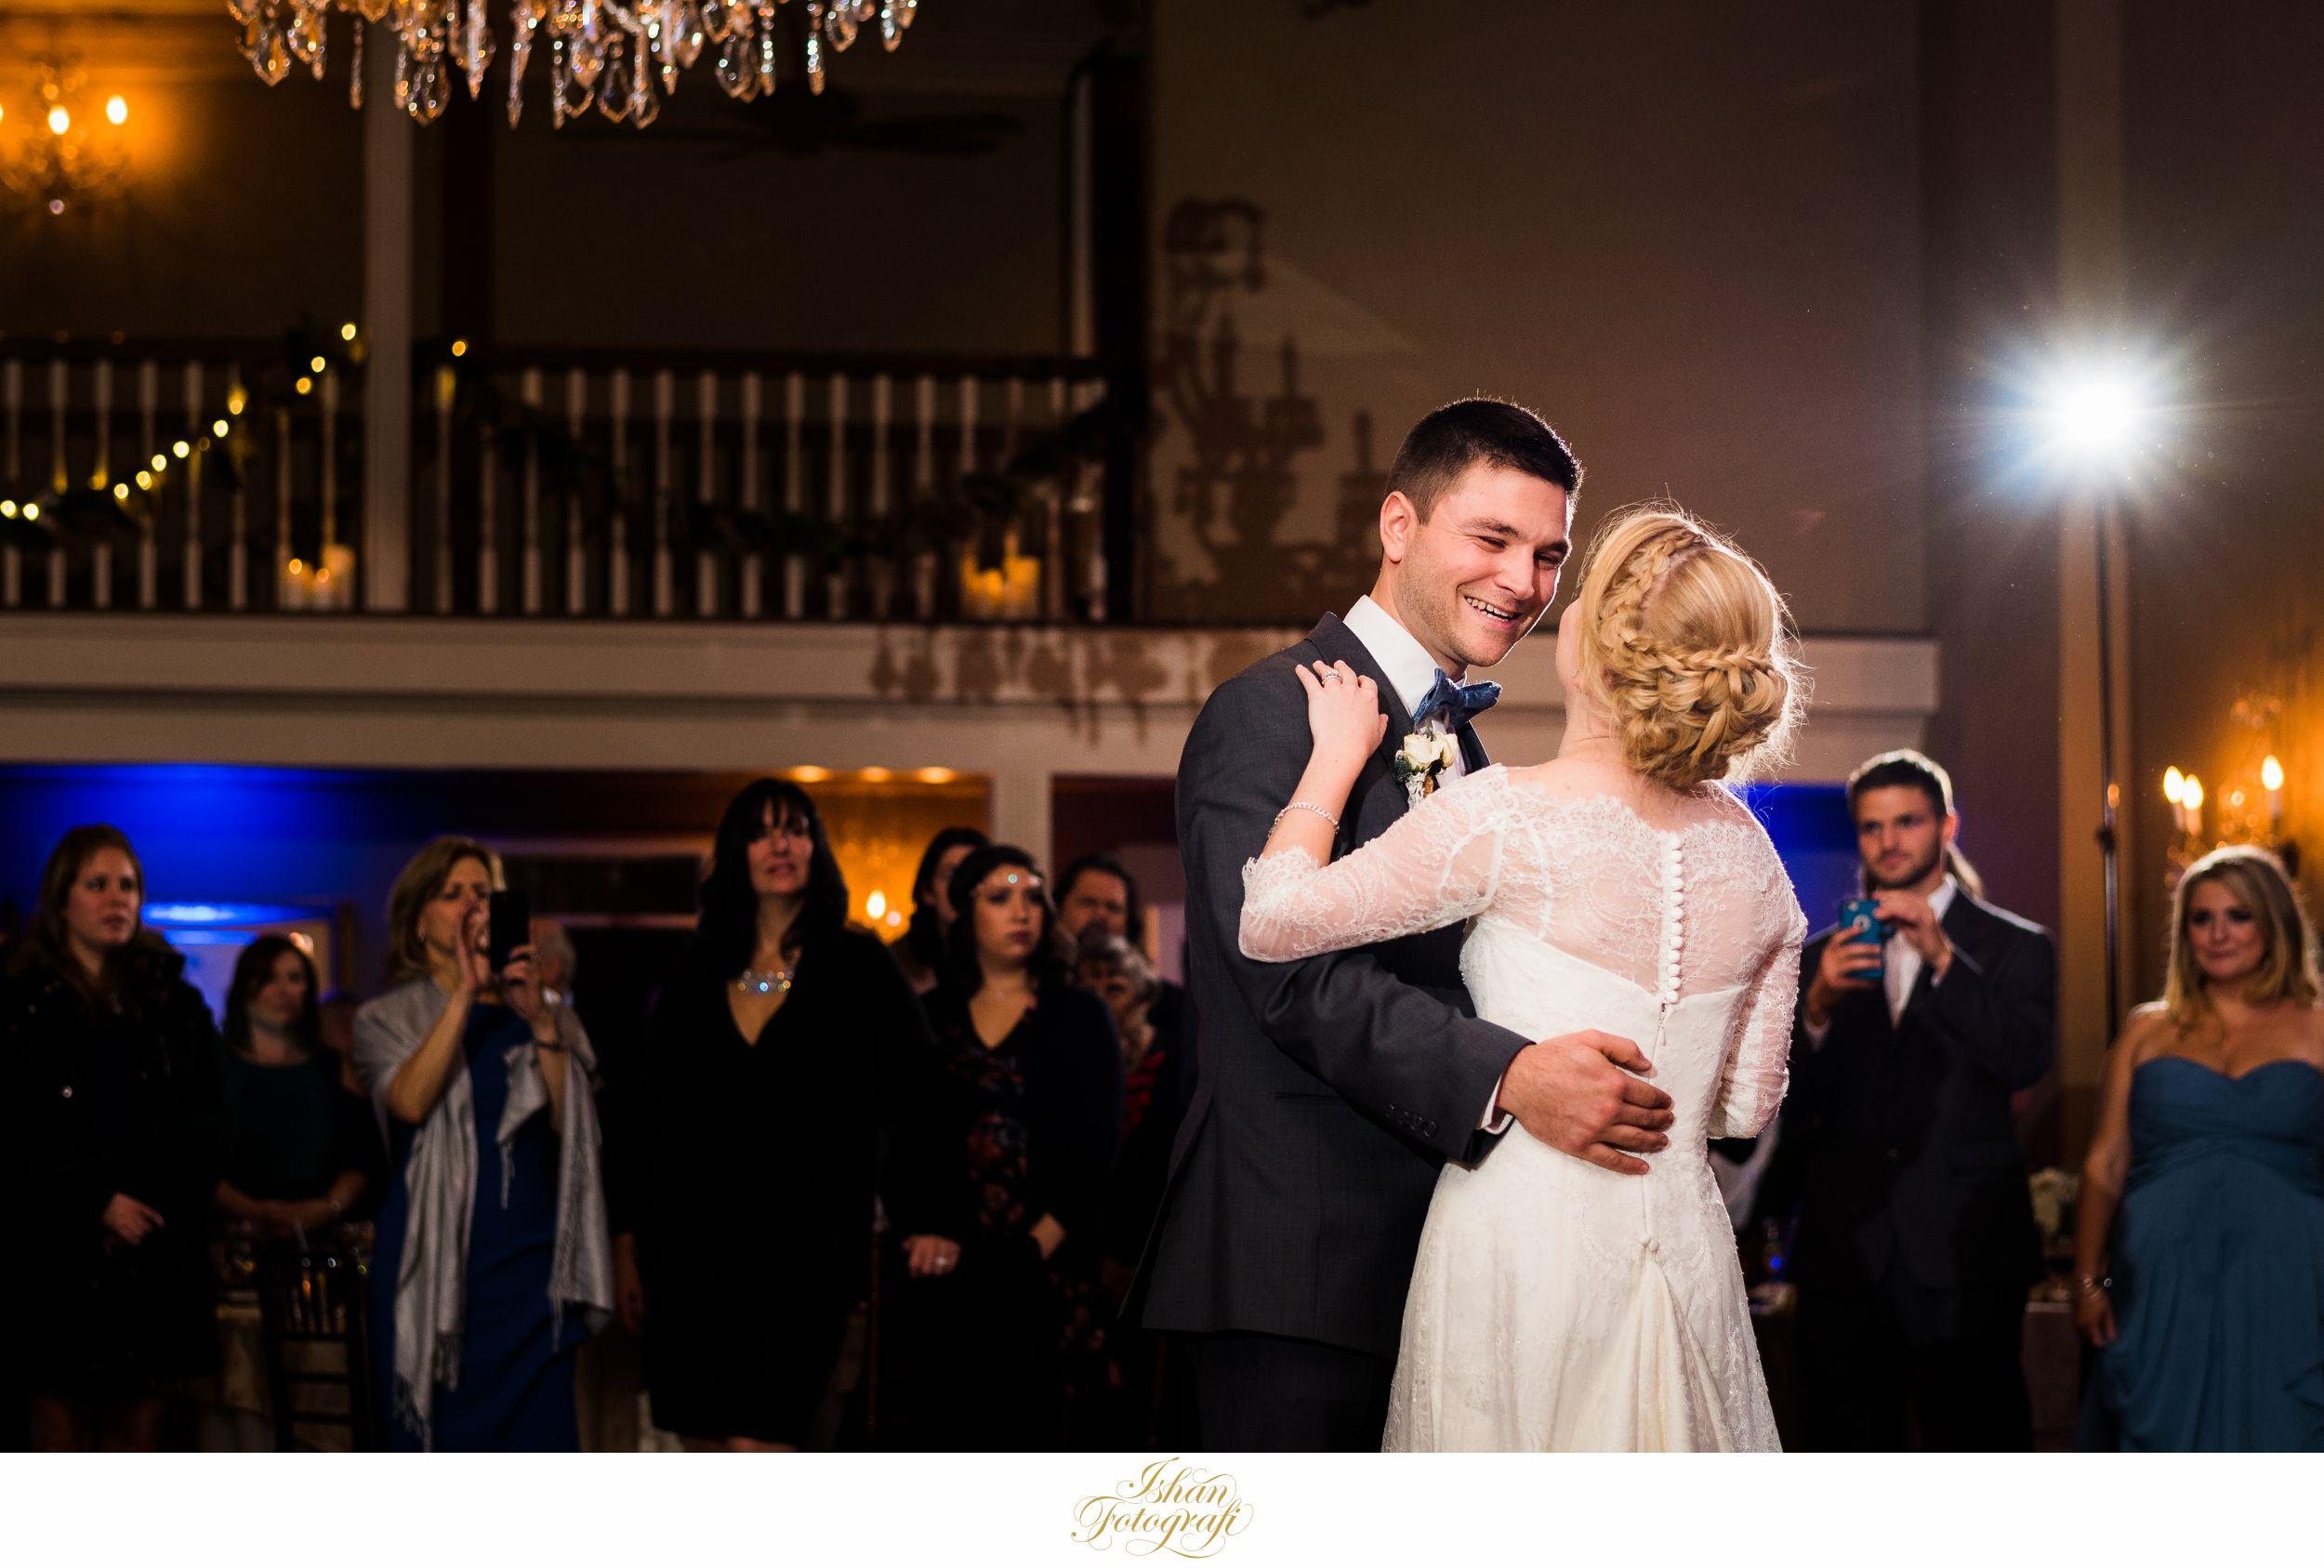 davids-country-inn-wedding-reception